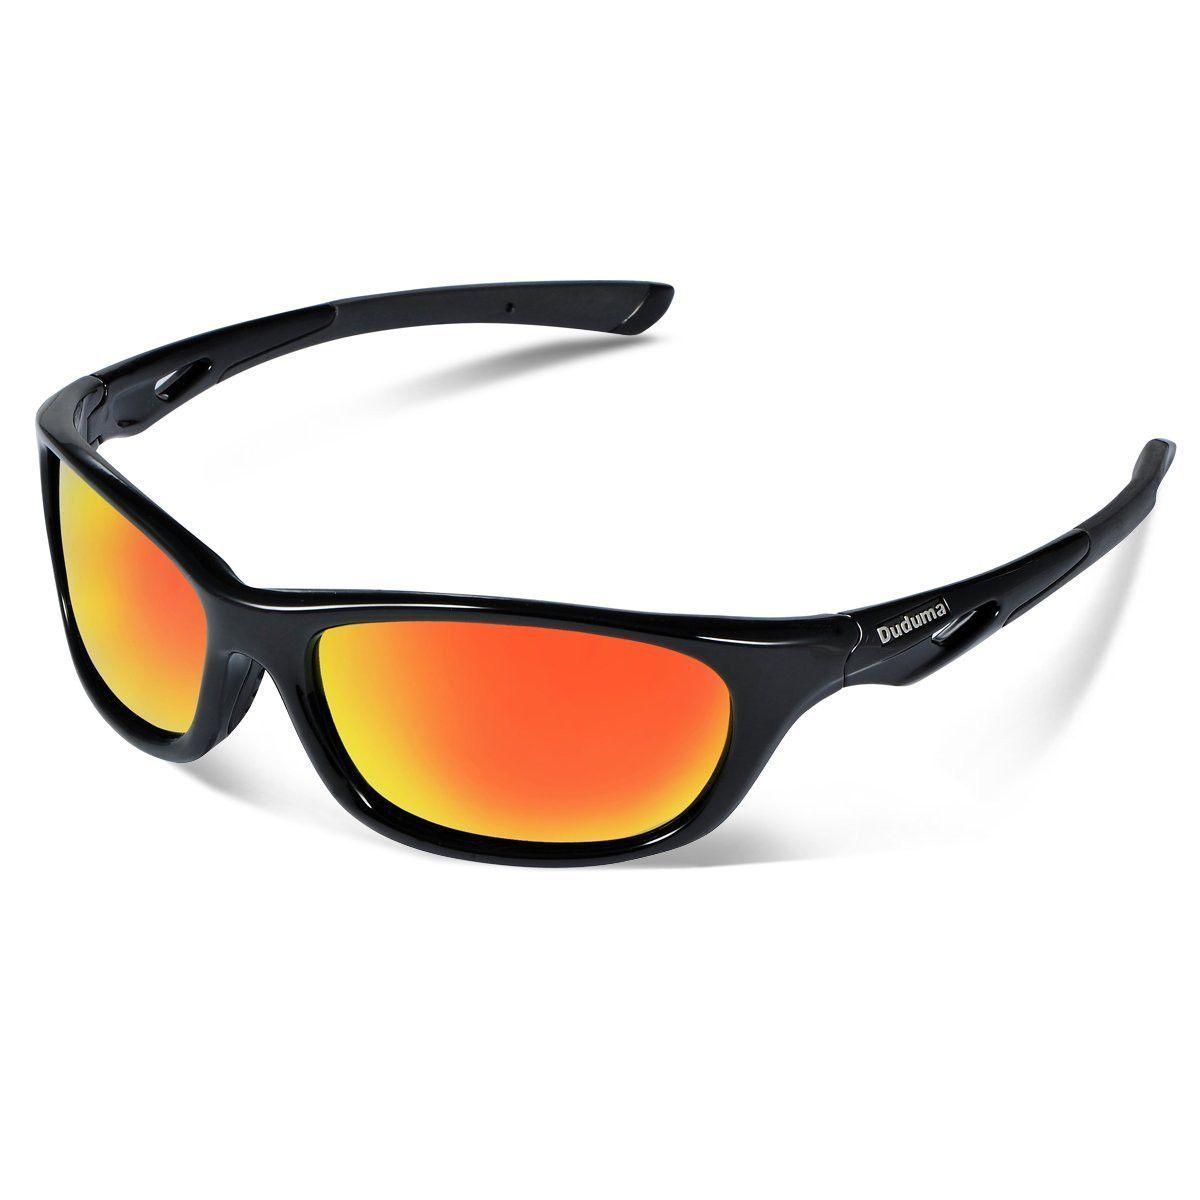 ba3a7a68e3 Duduma Polarized Sports Sunglasses for Men Women Baseball Running Cycling  Fishing Driving Golf Unbreakable Frame Du646